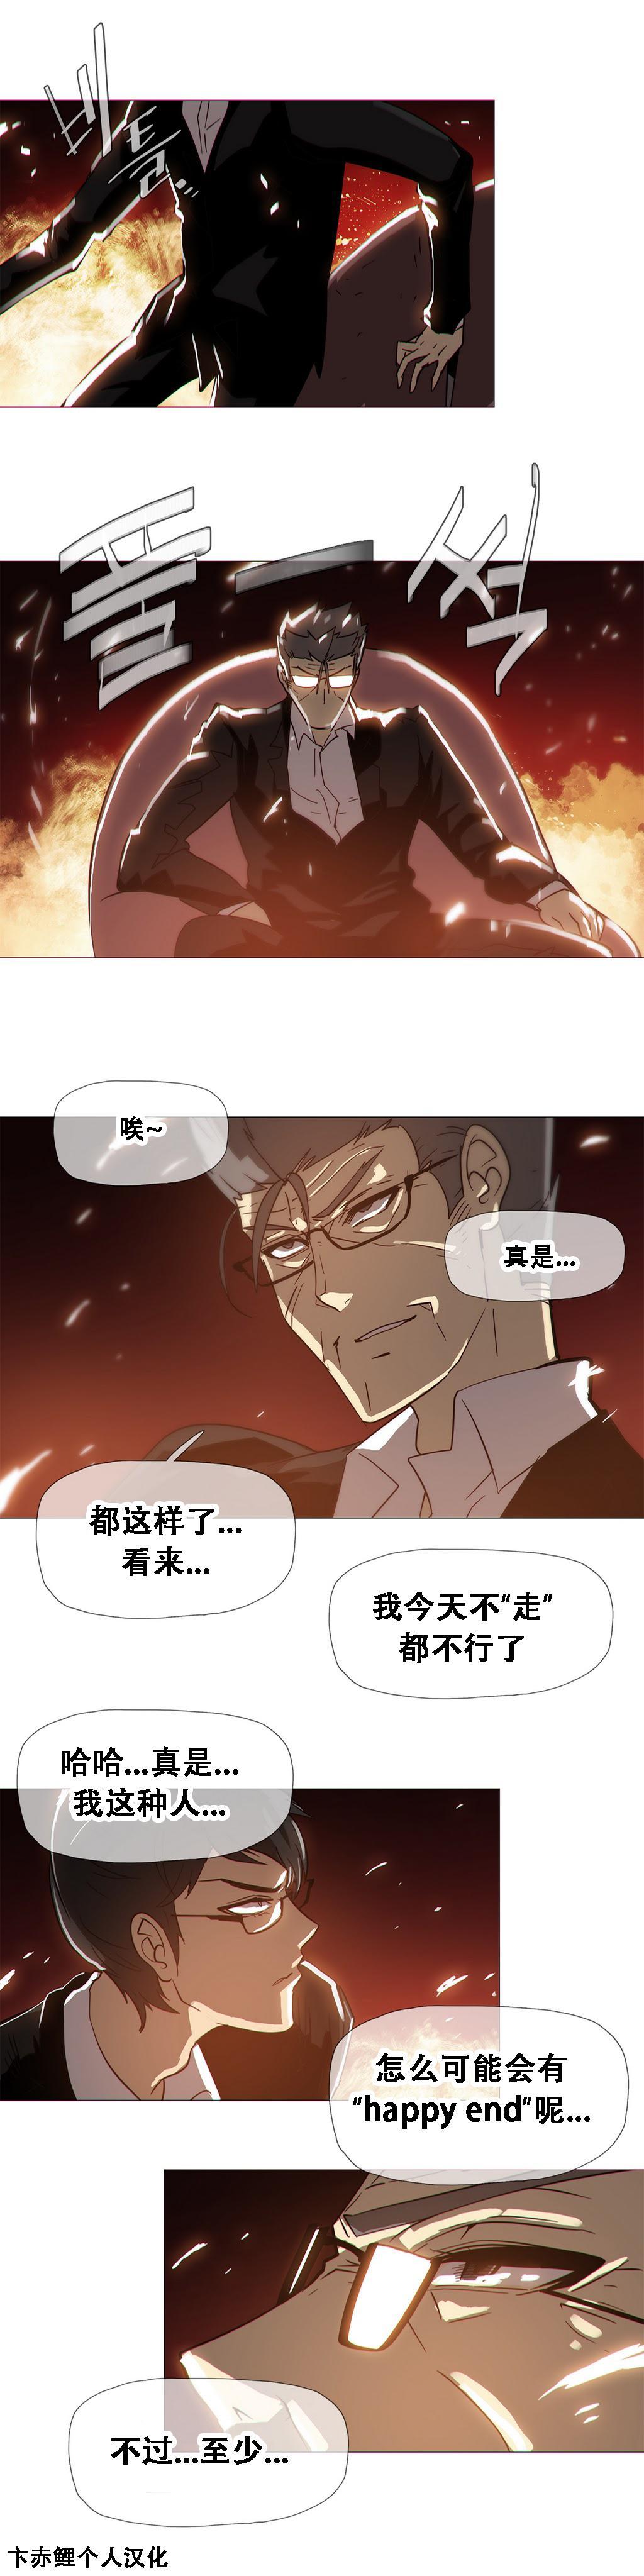 HouseHold Affairs 【卞赤鲤个人汉化】1~21话(持续更新中) 397